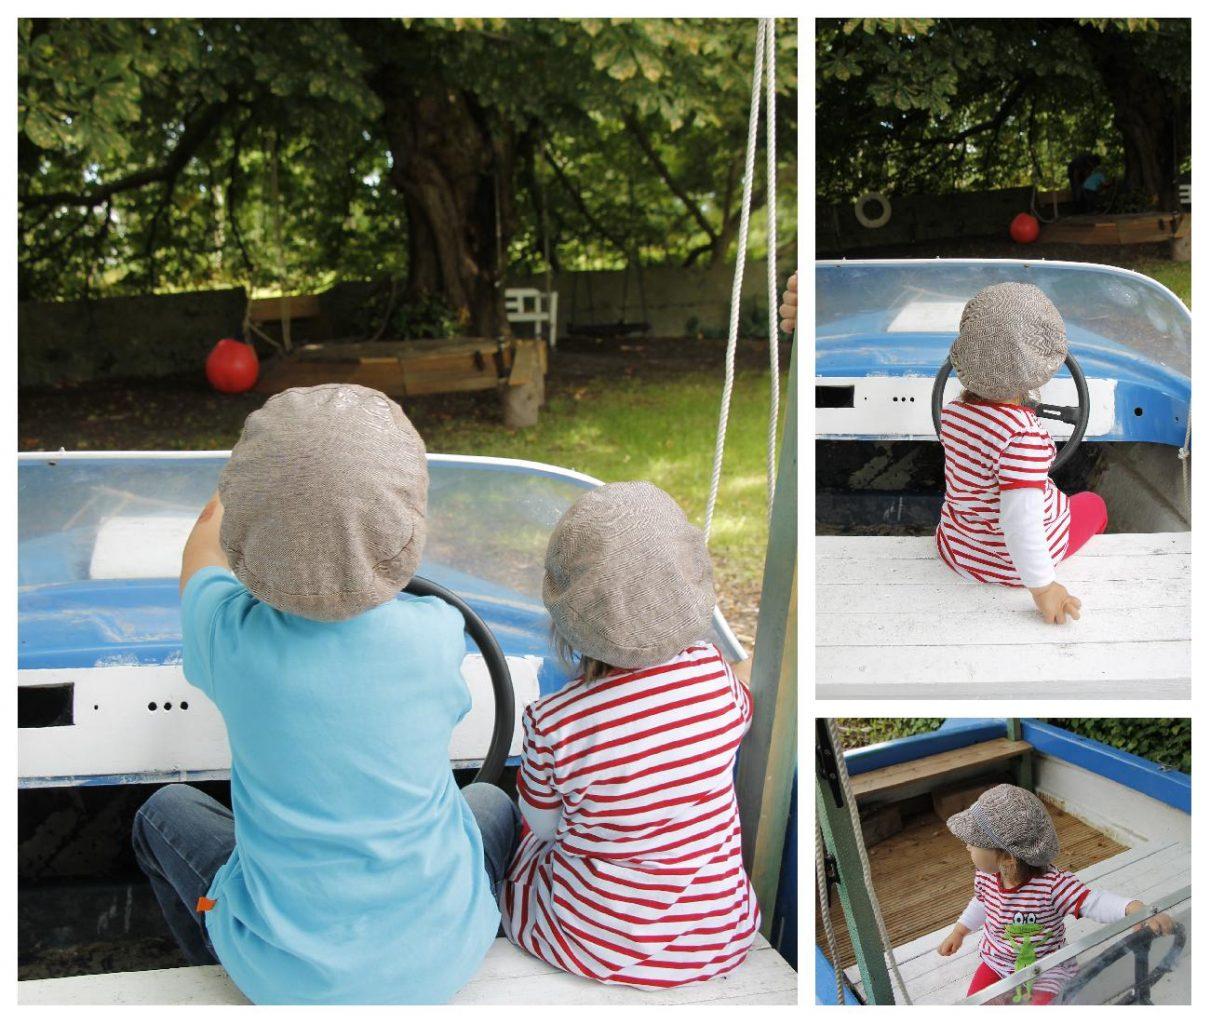 Lipfish Kinderkleidung